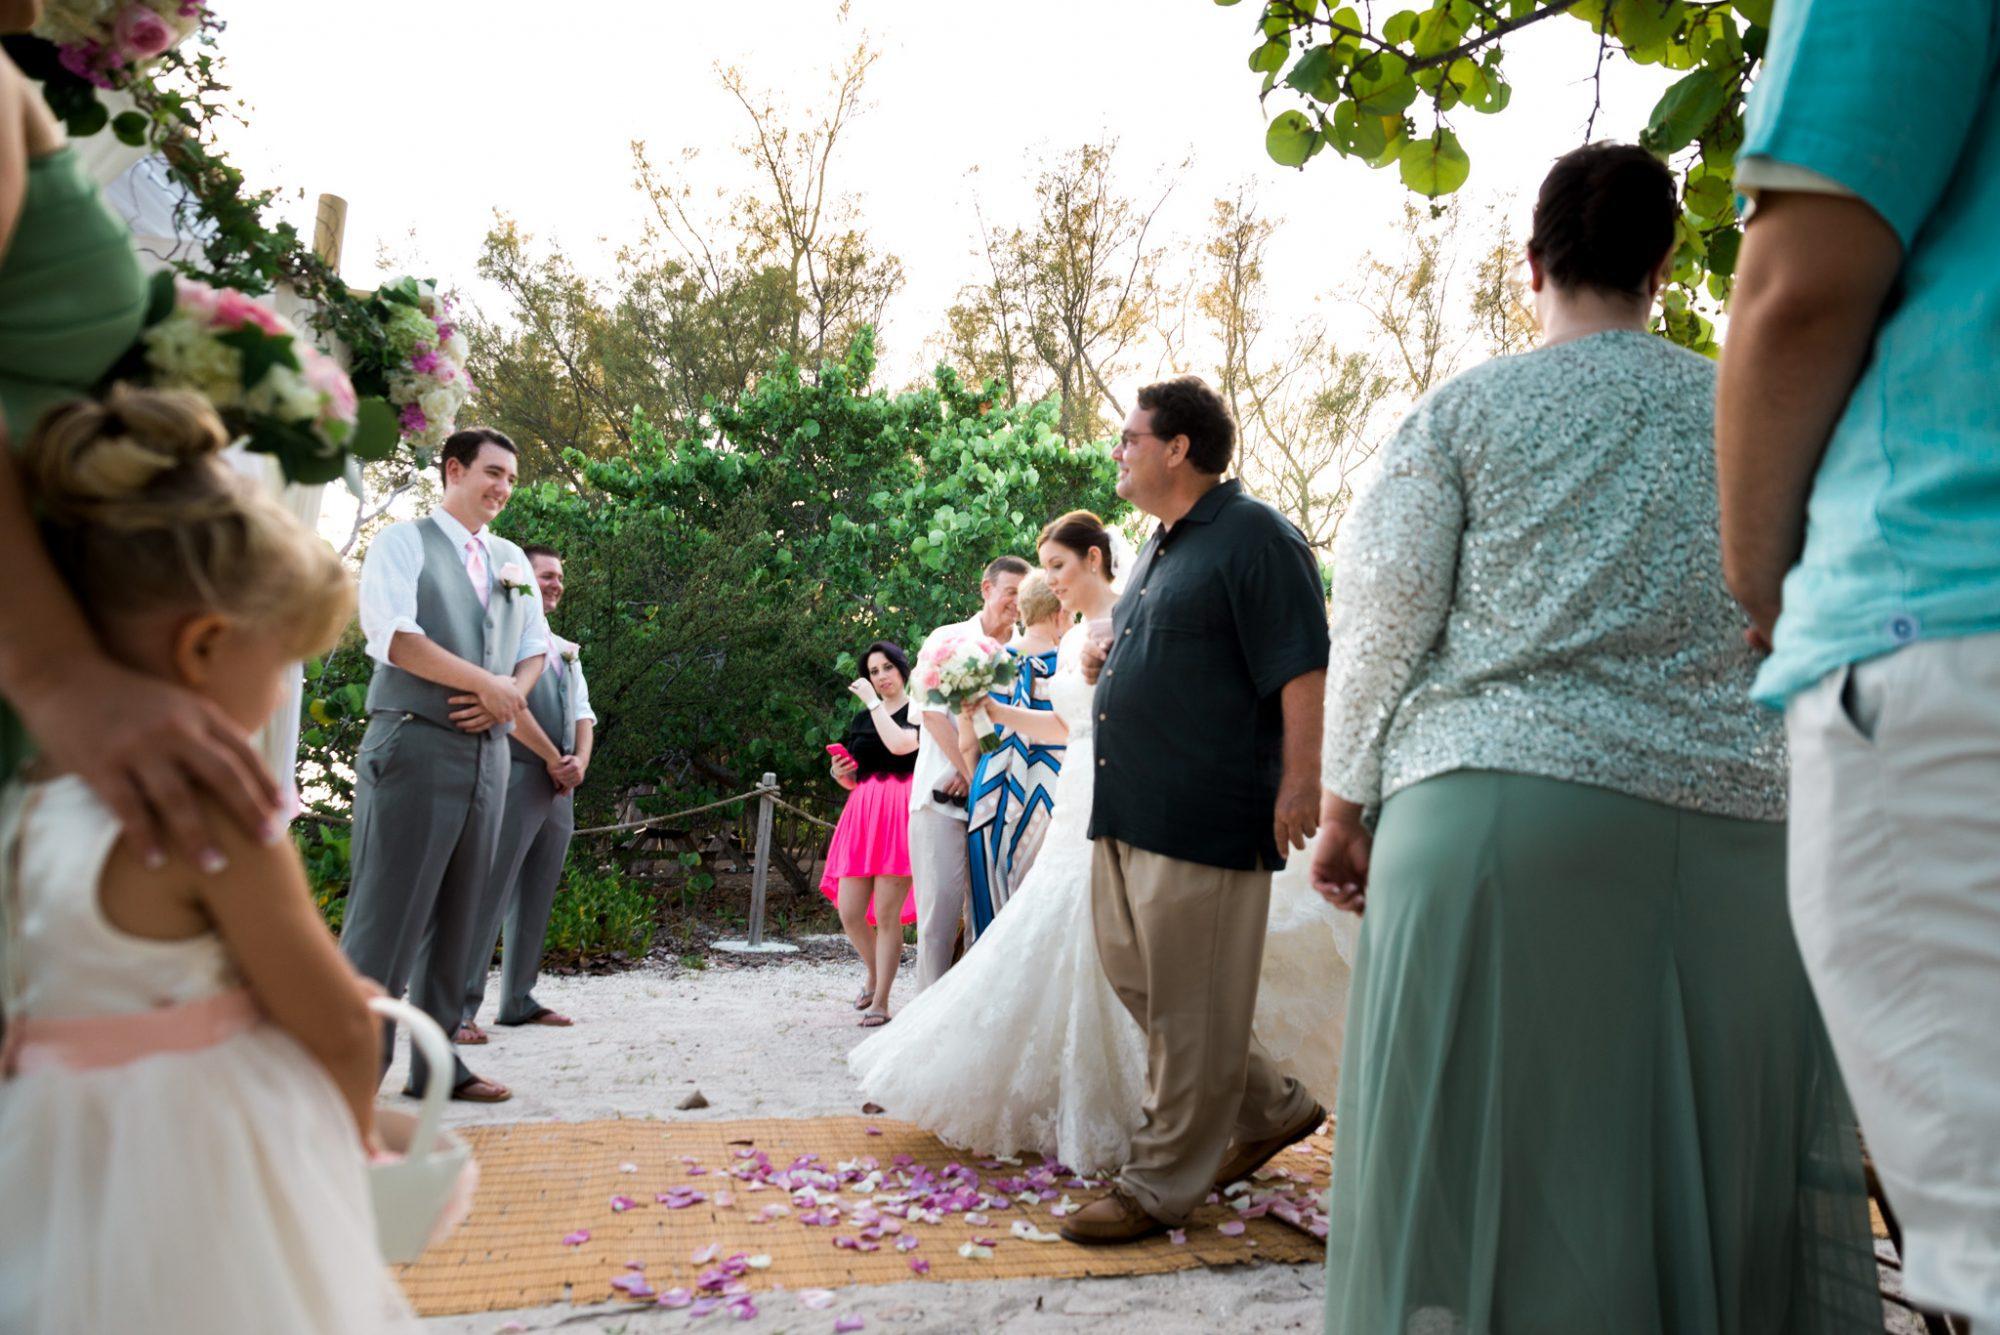 Heather Jeff Key West Wedding Photographer Fort Zachary Taylor 19 - Heather & Jeff - Key West Wedding Photographer - Fort Zachary Taylor